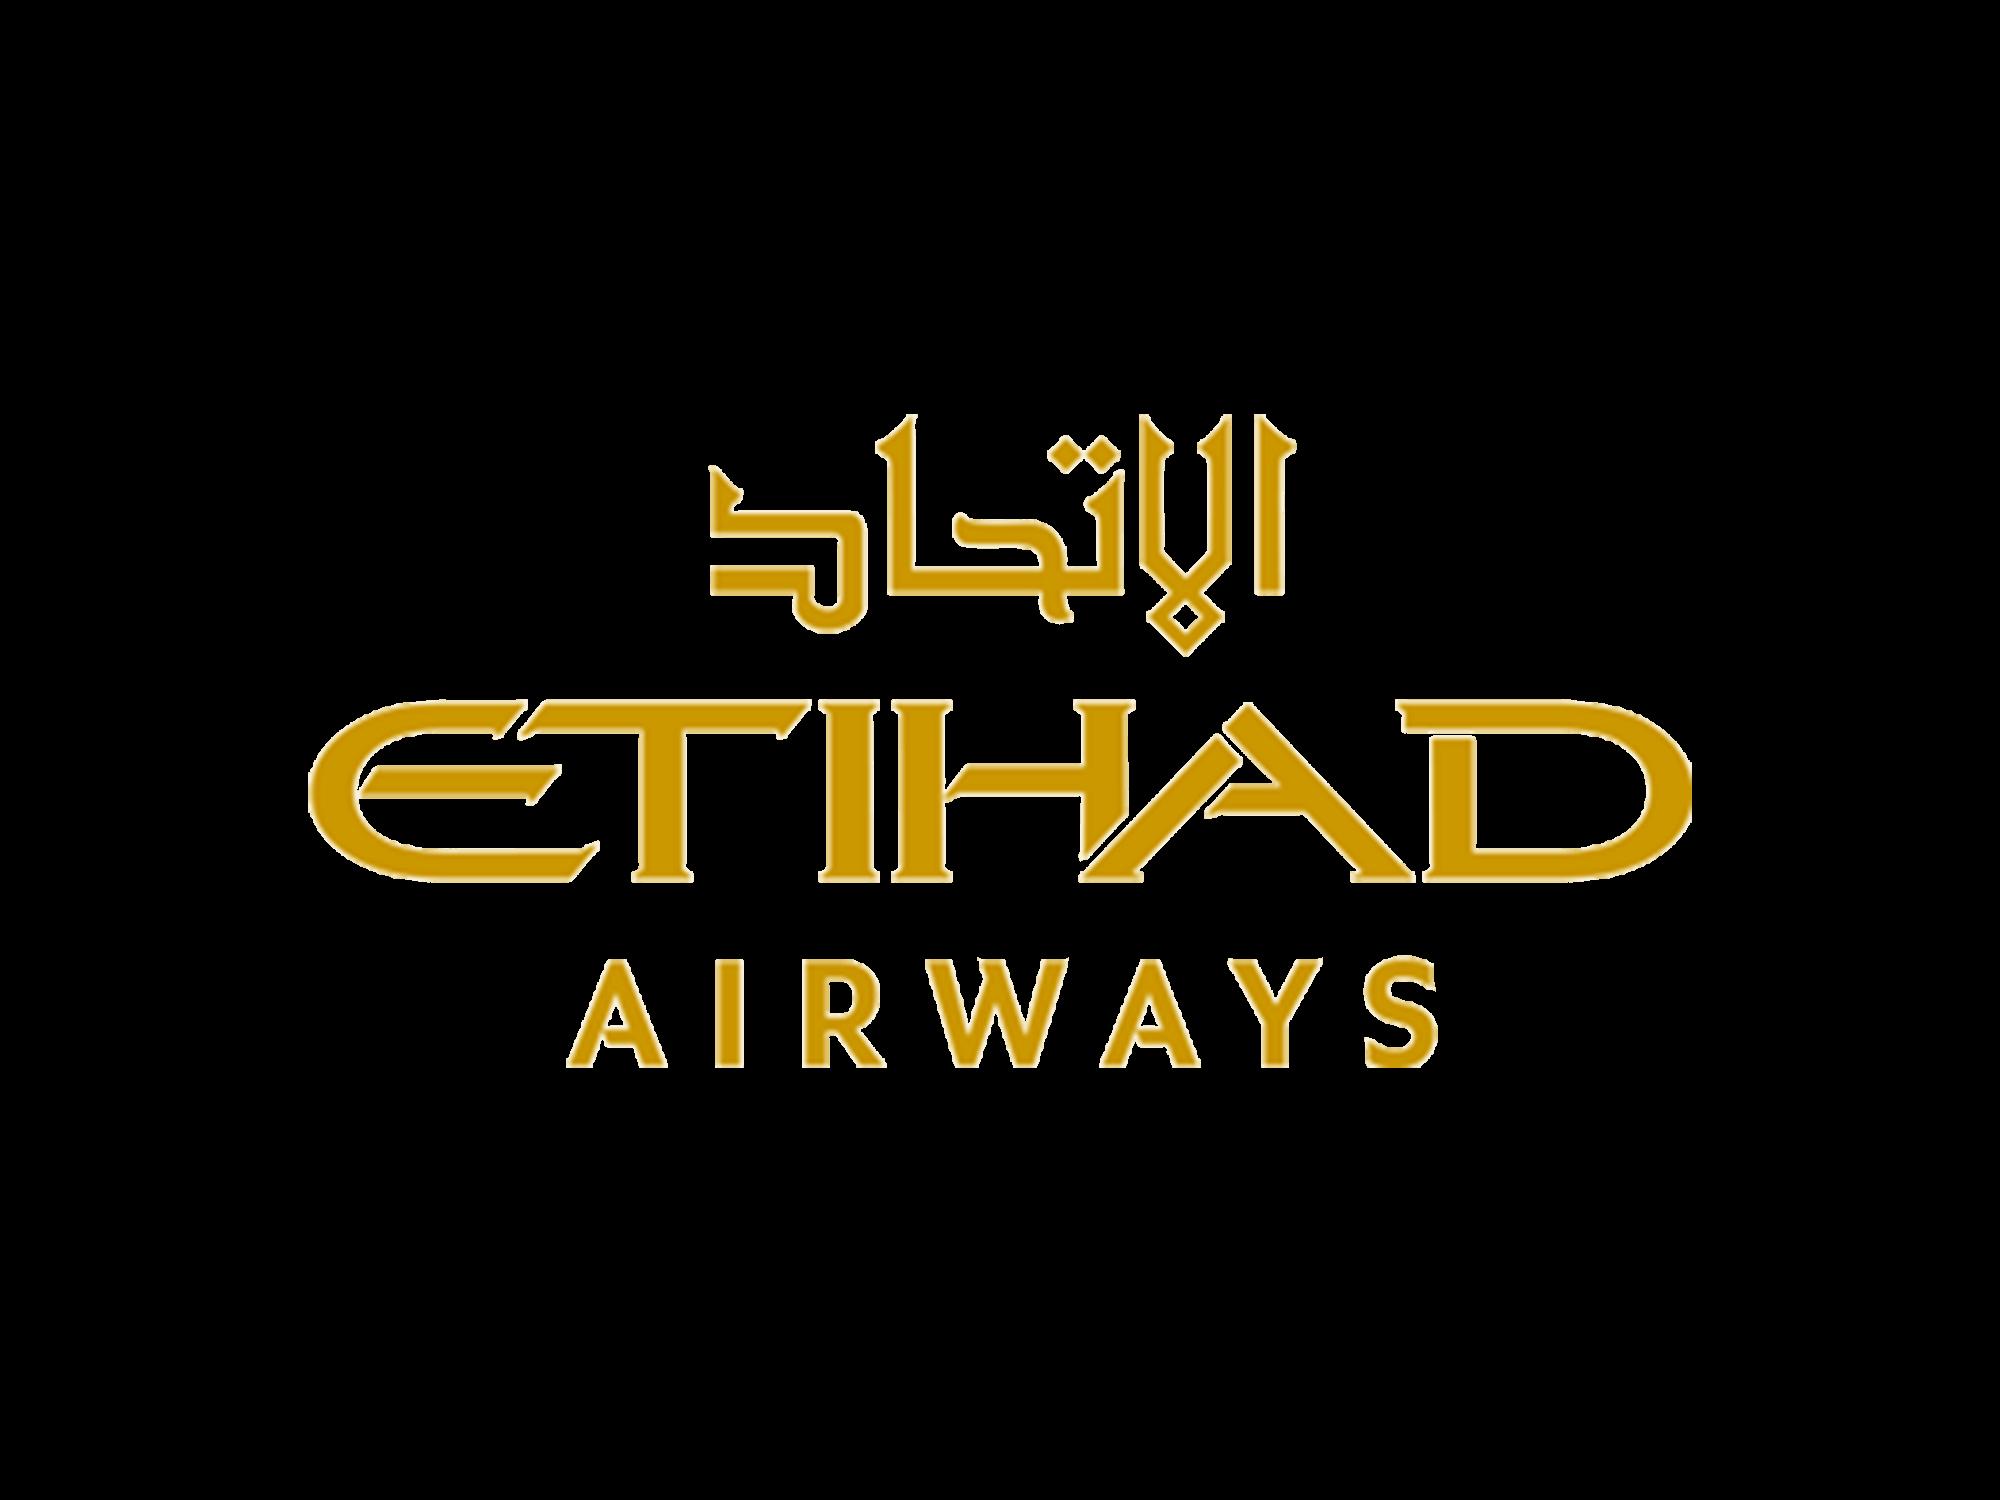 etihad trans logo.png